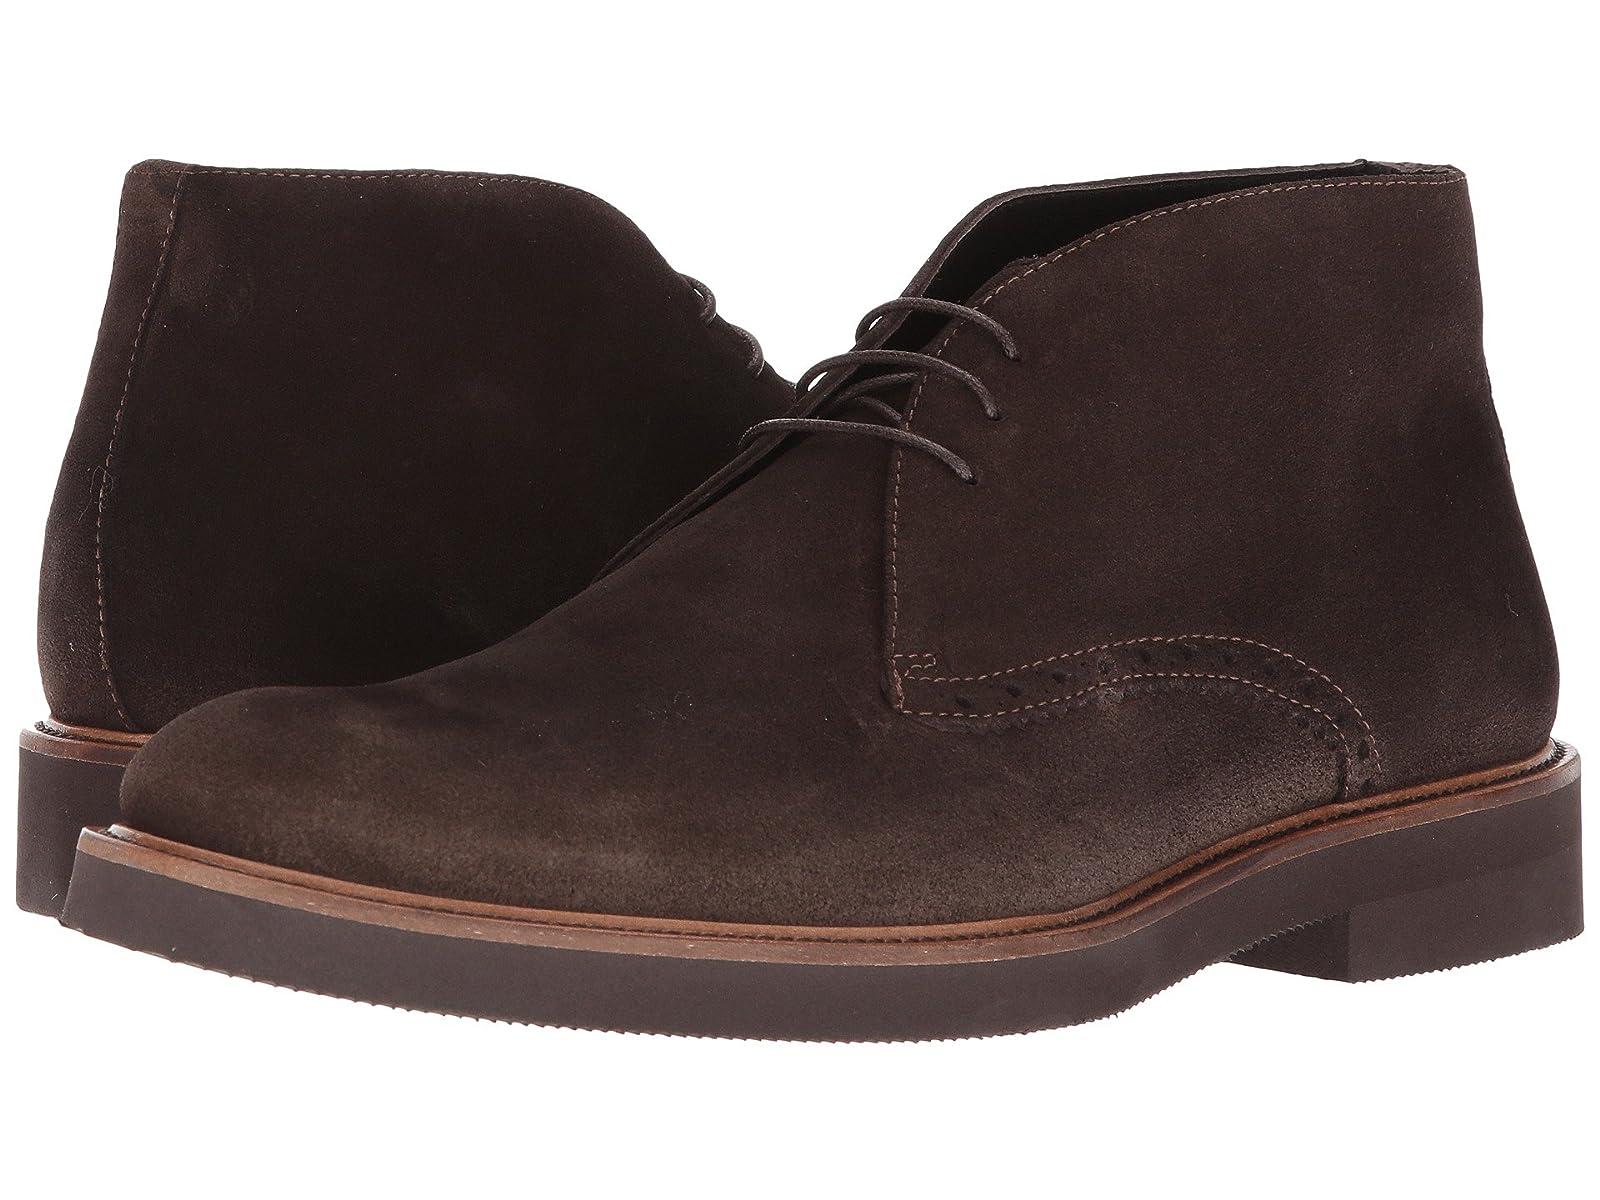 BUGATCHI Verona Chukka BootSelling fashionable and eye-catching shoes